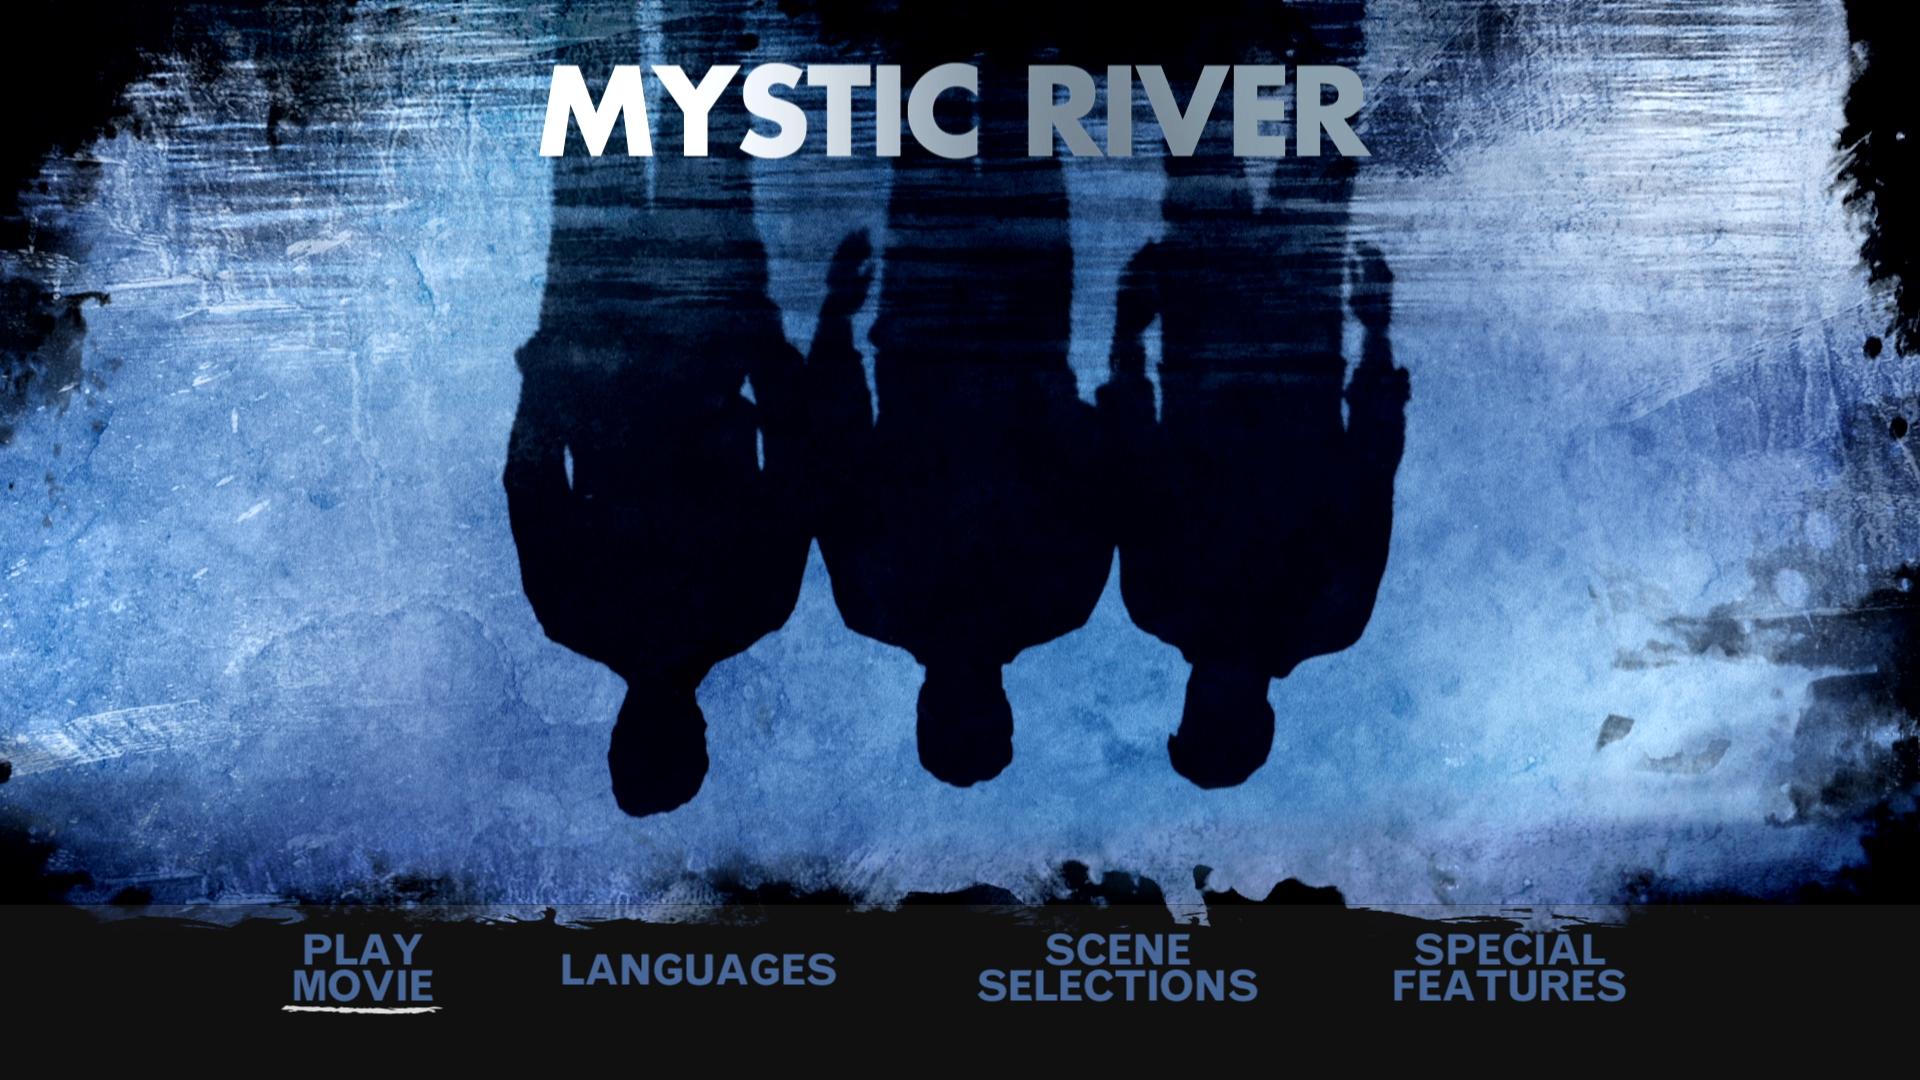 Mystic river movie mystic river - 1920x1080